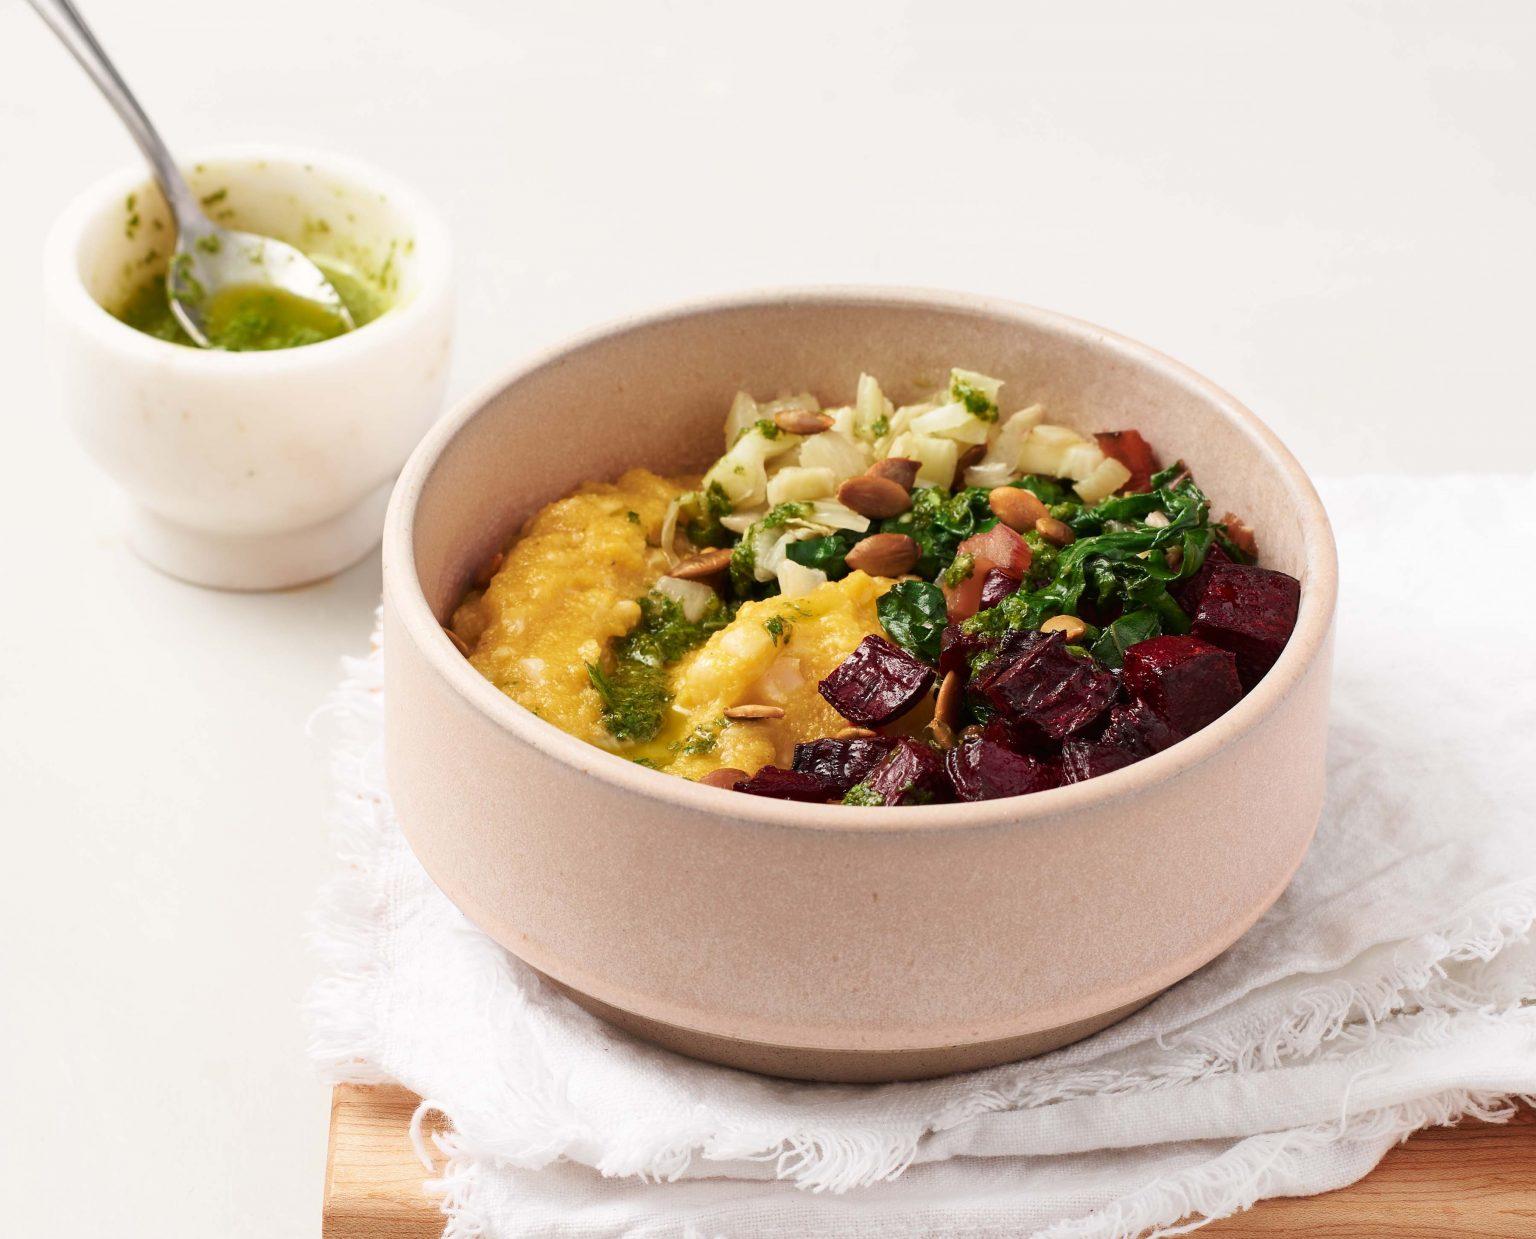 Vegan Cauliflower-Polenta Bowls with Greens